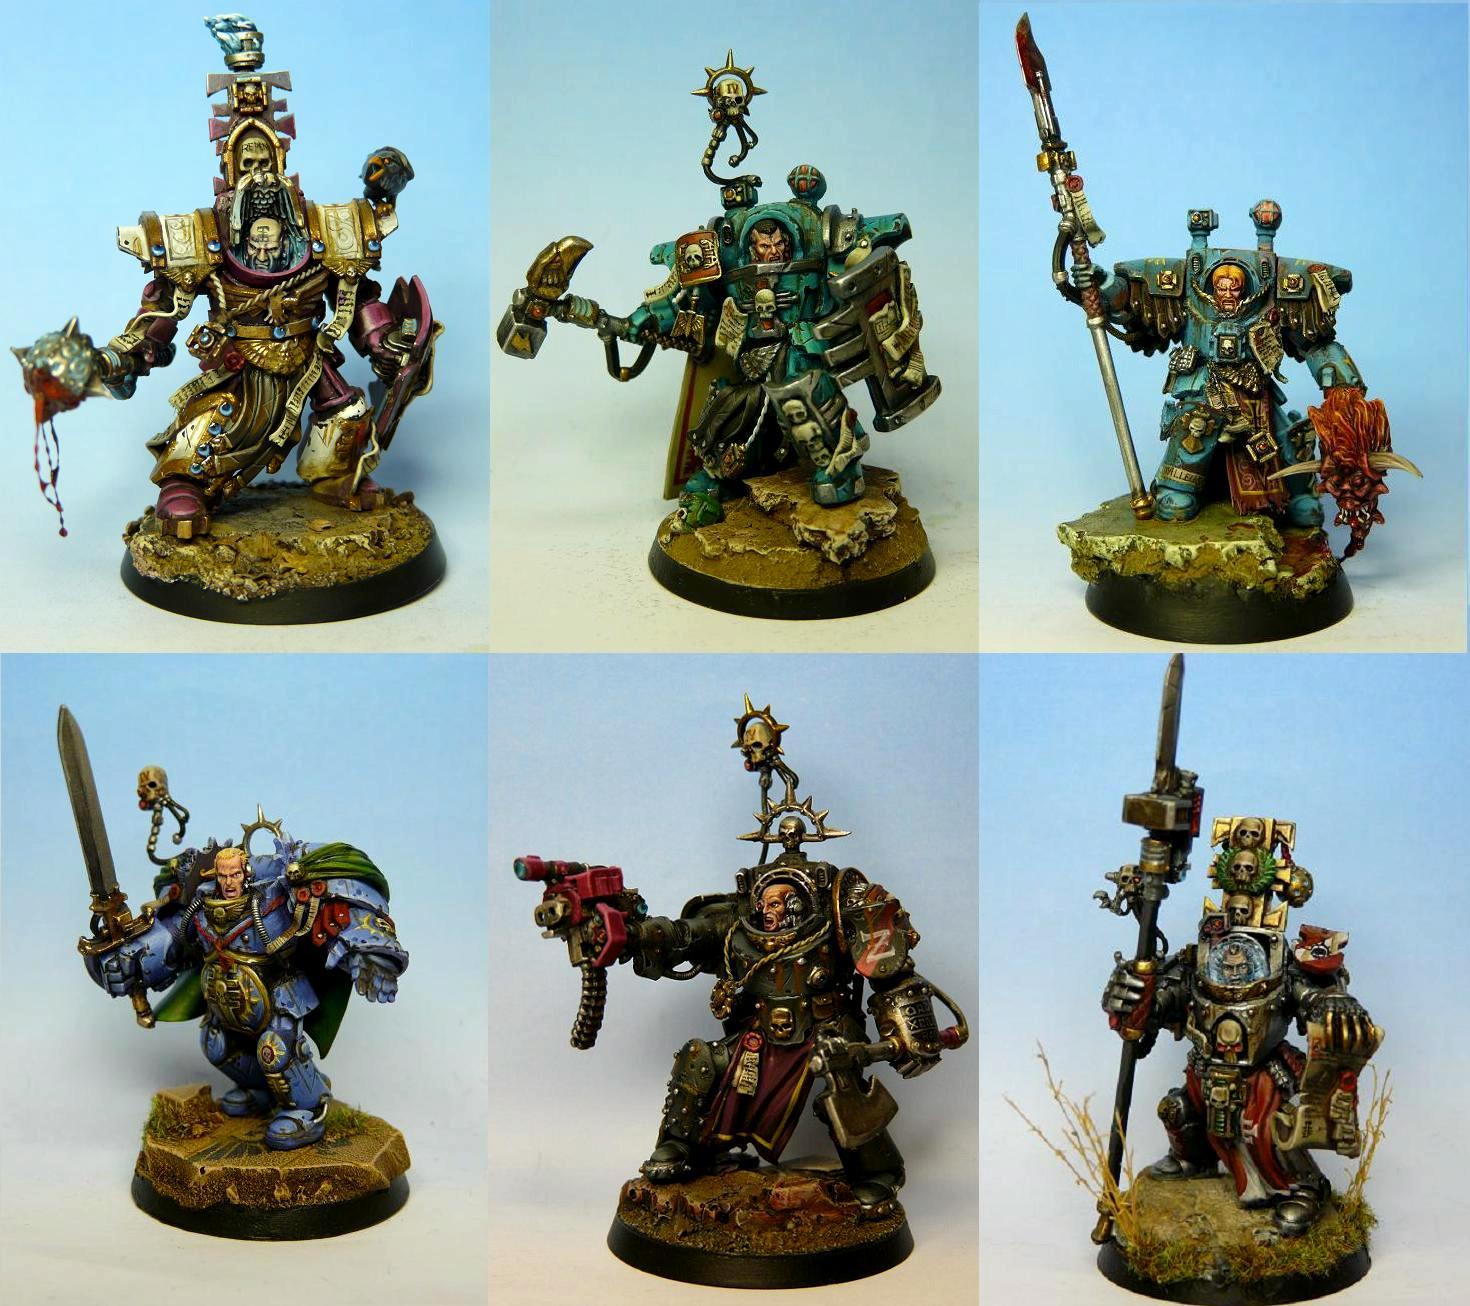 Conversion, Daemonhunters, Inquisition, Inquisitor, Ordo Malleus, Terminator Armor, Warhammer 40,000, Witch Hunters